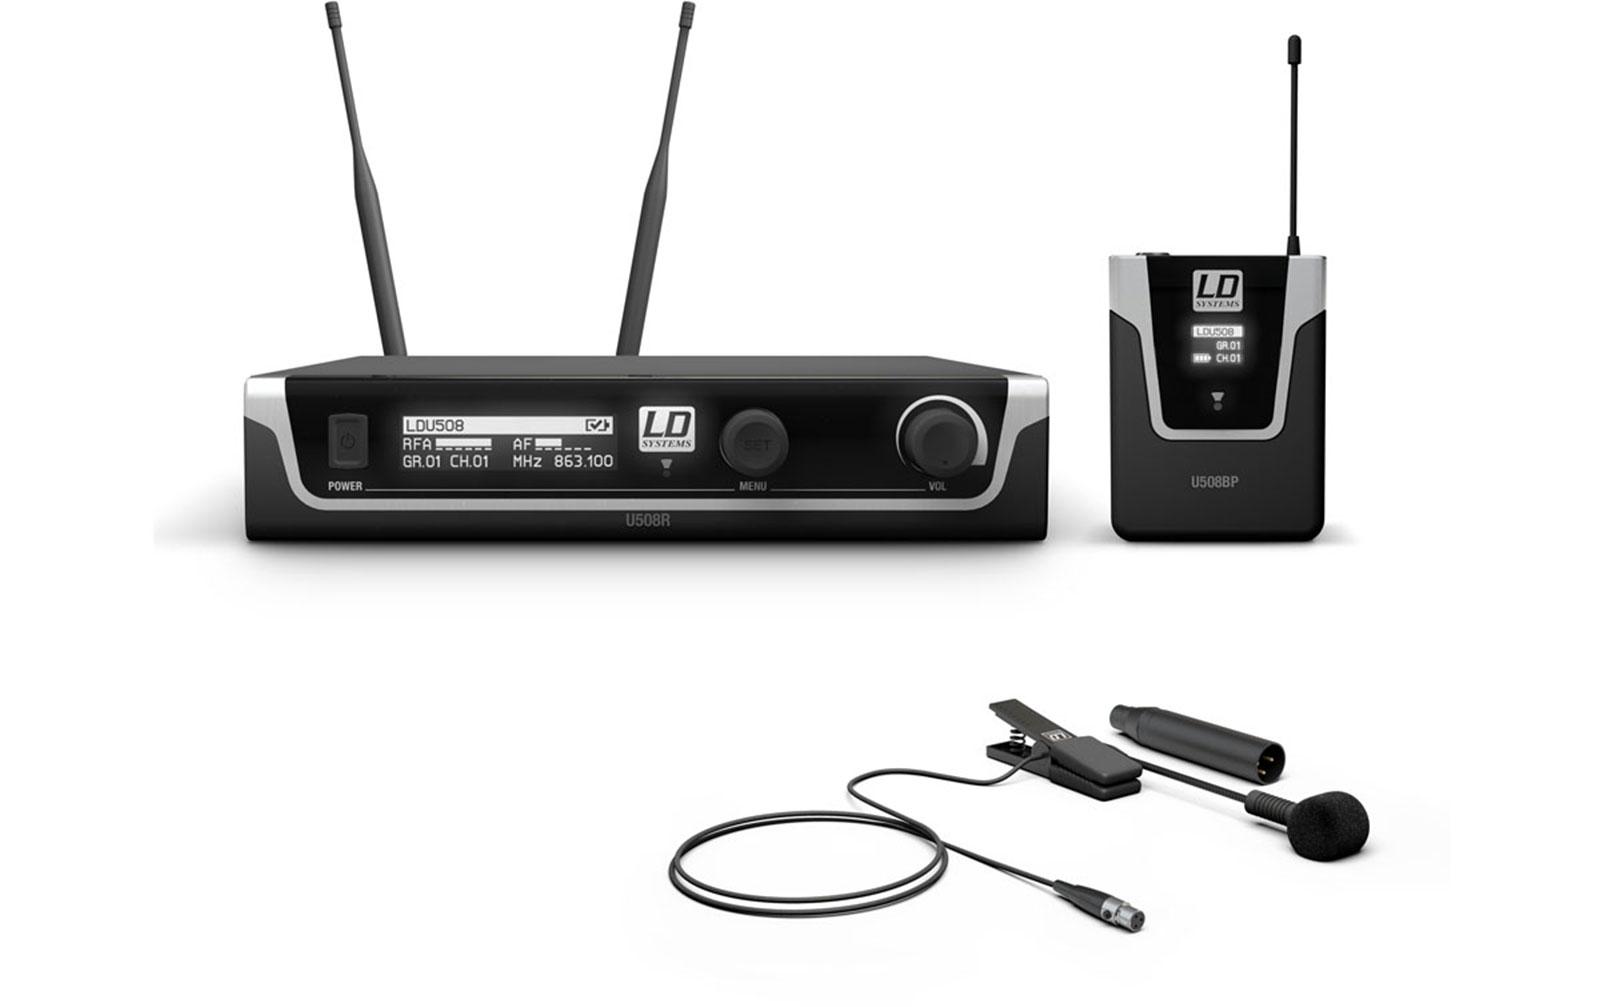 ld-systems-u508-bpw-funkmikrofon-system-mit-bodypack-und-blasinstrumenten-mikrofon